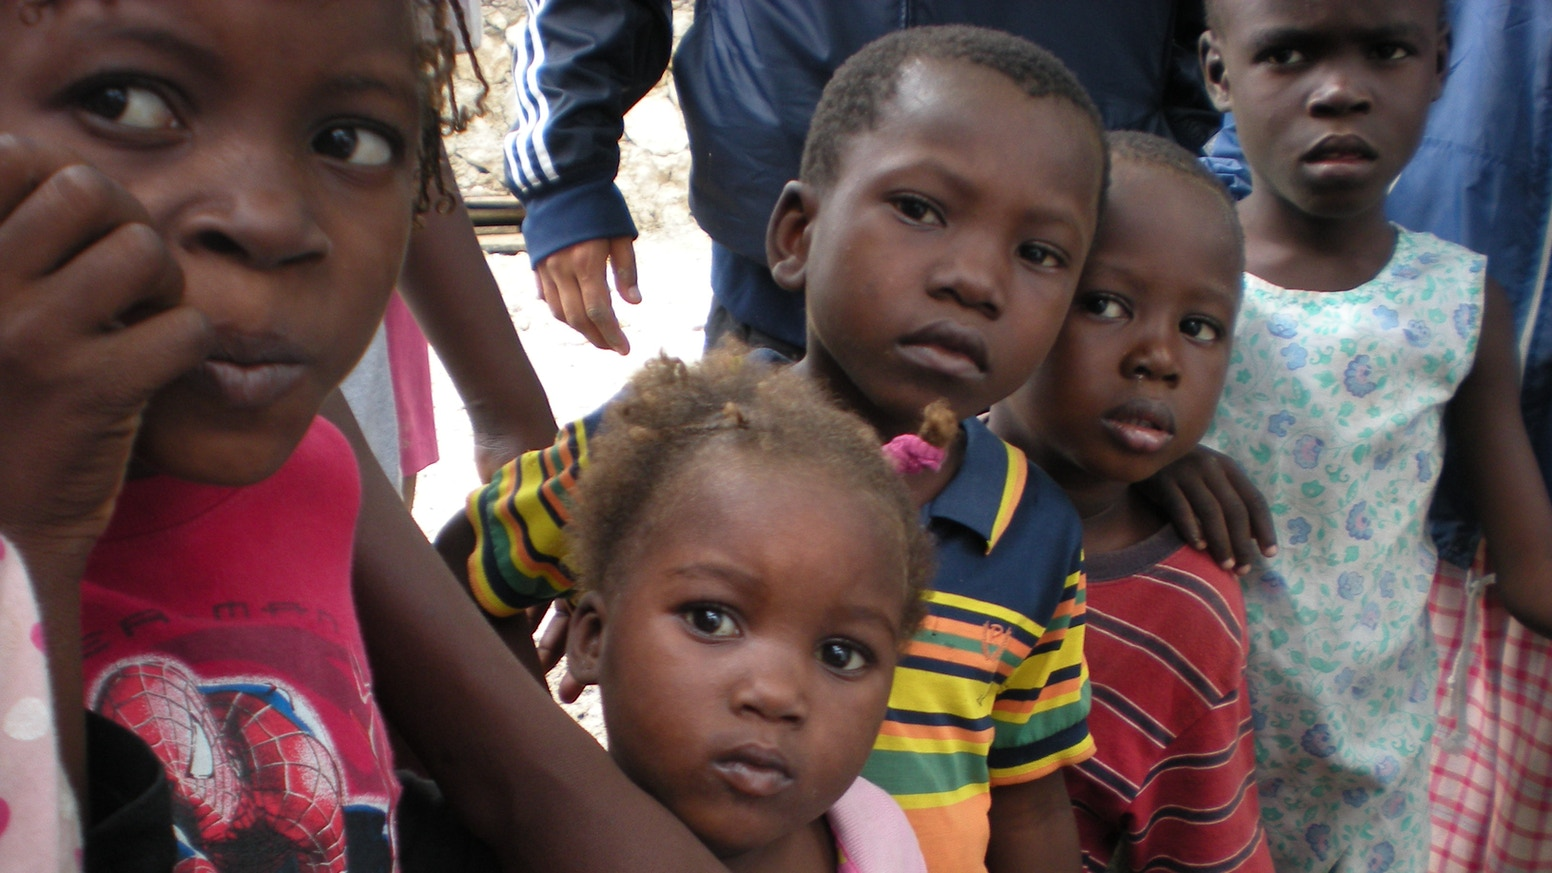 haiti haitian documentary grace hope faces deleted project struggles bridges brought heart